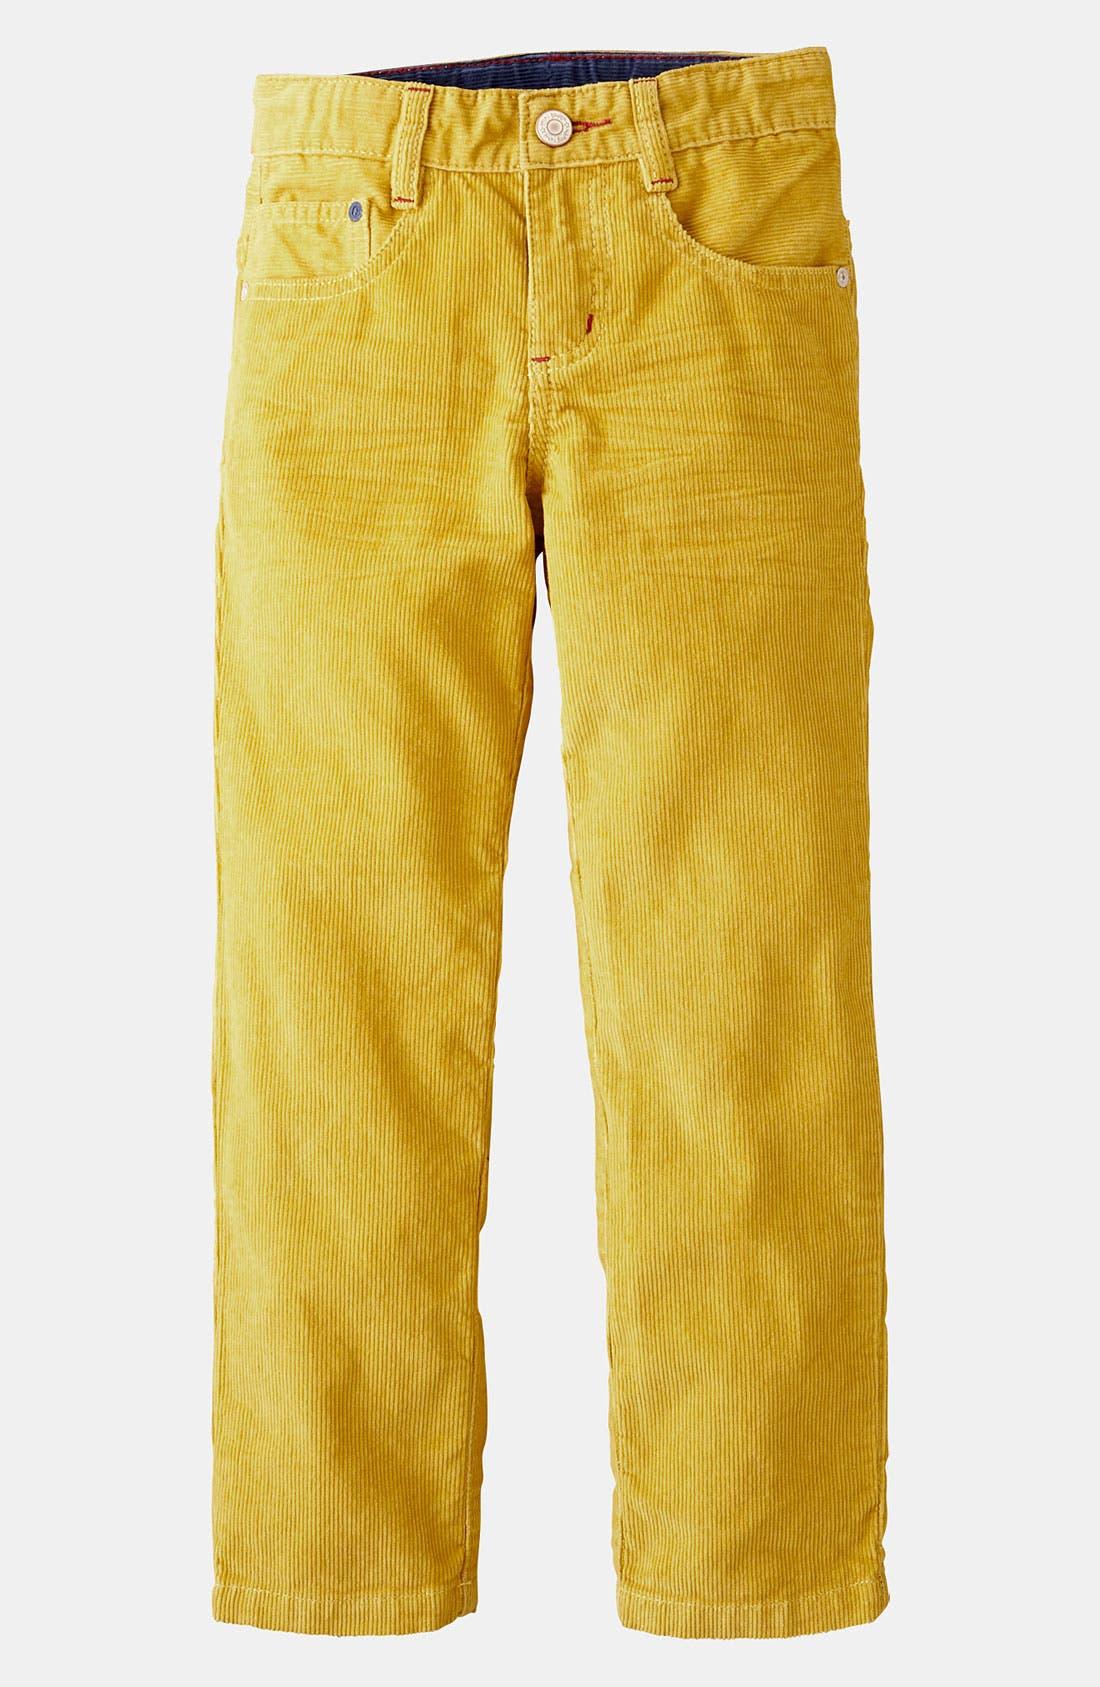 Main Image - Mini Boden 'Preppy' Slim Corduroy Pants (Little Boys & Big Boys)